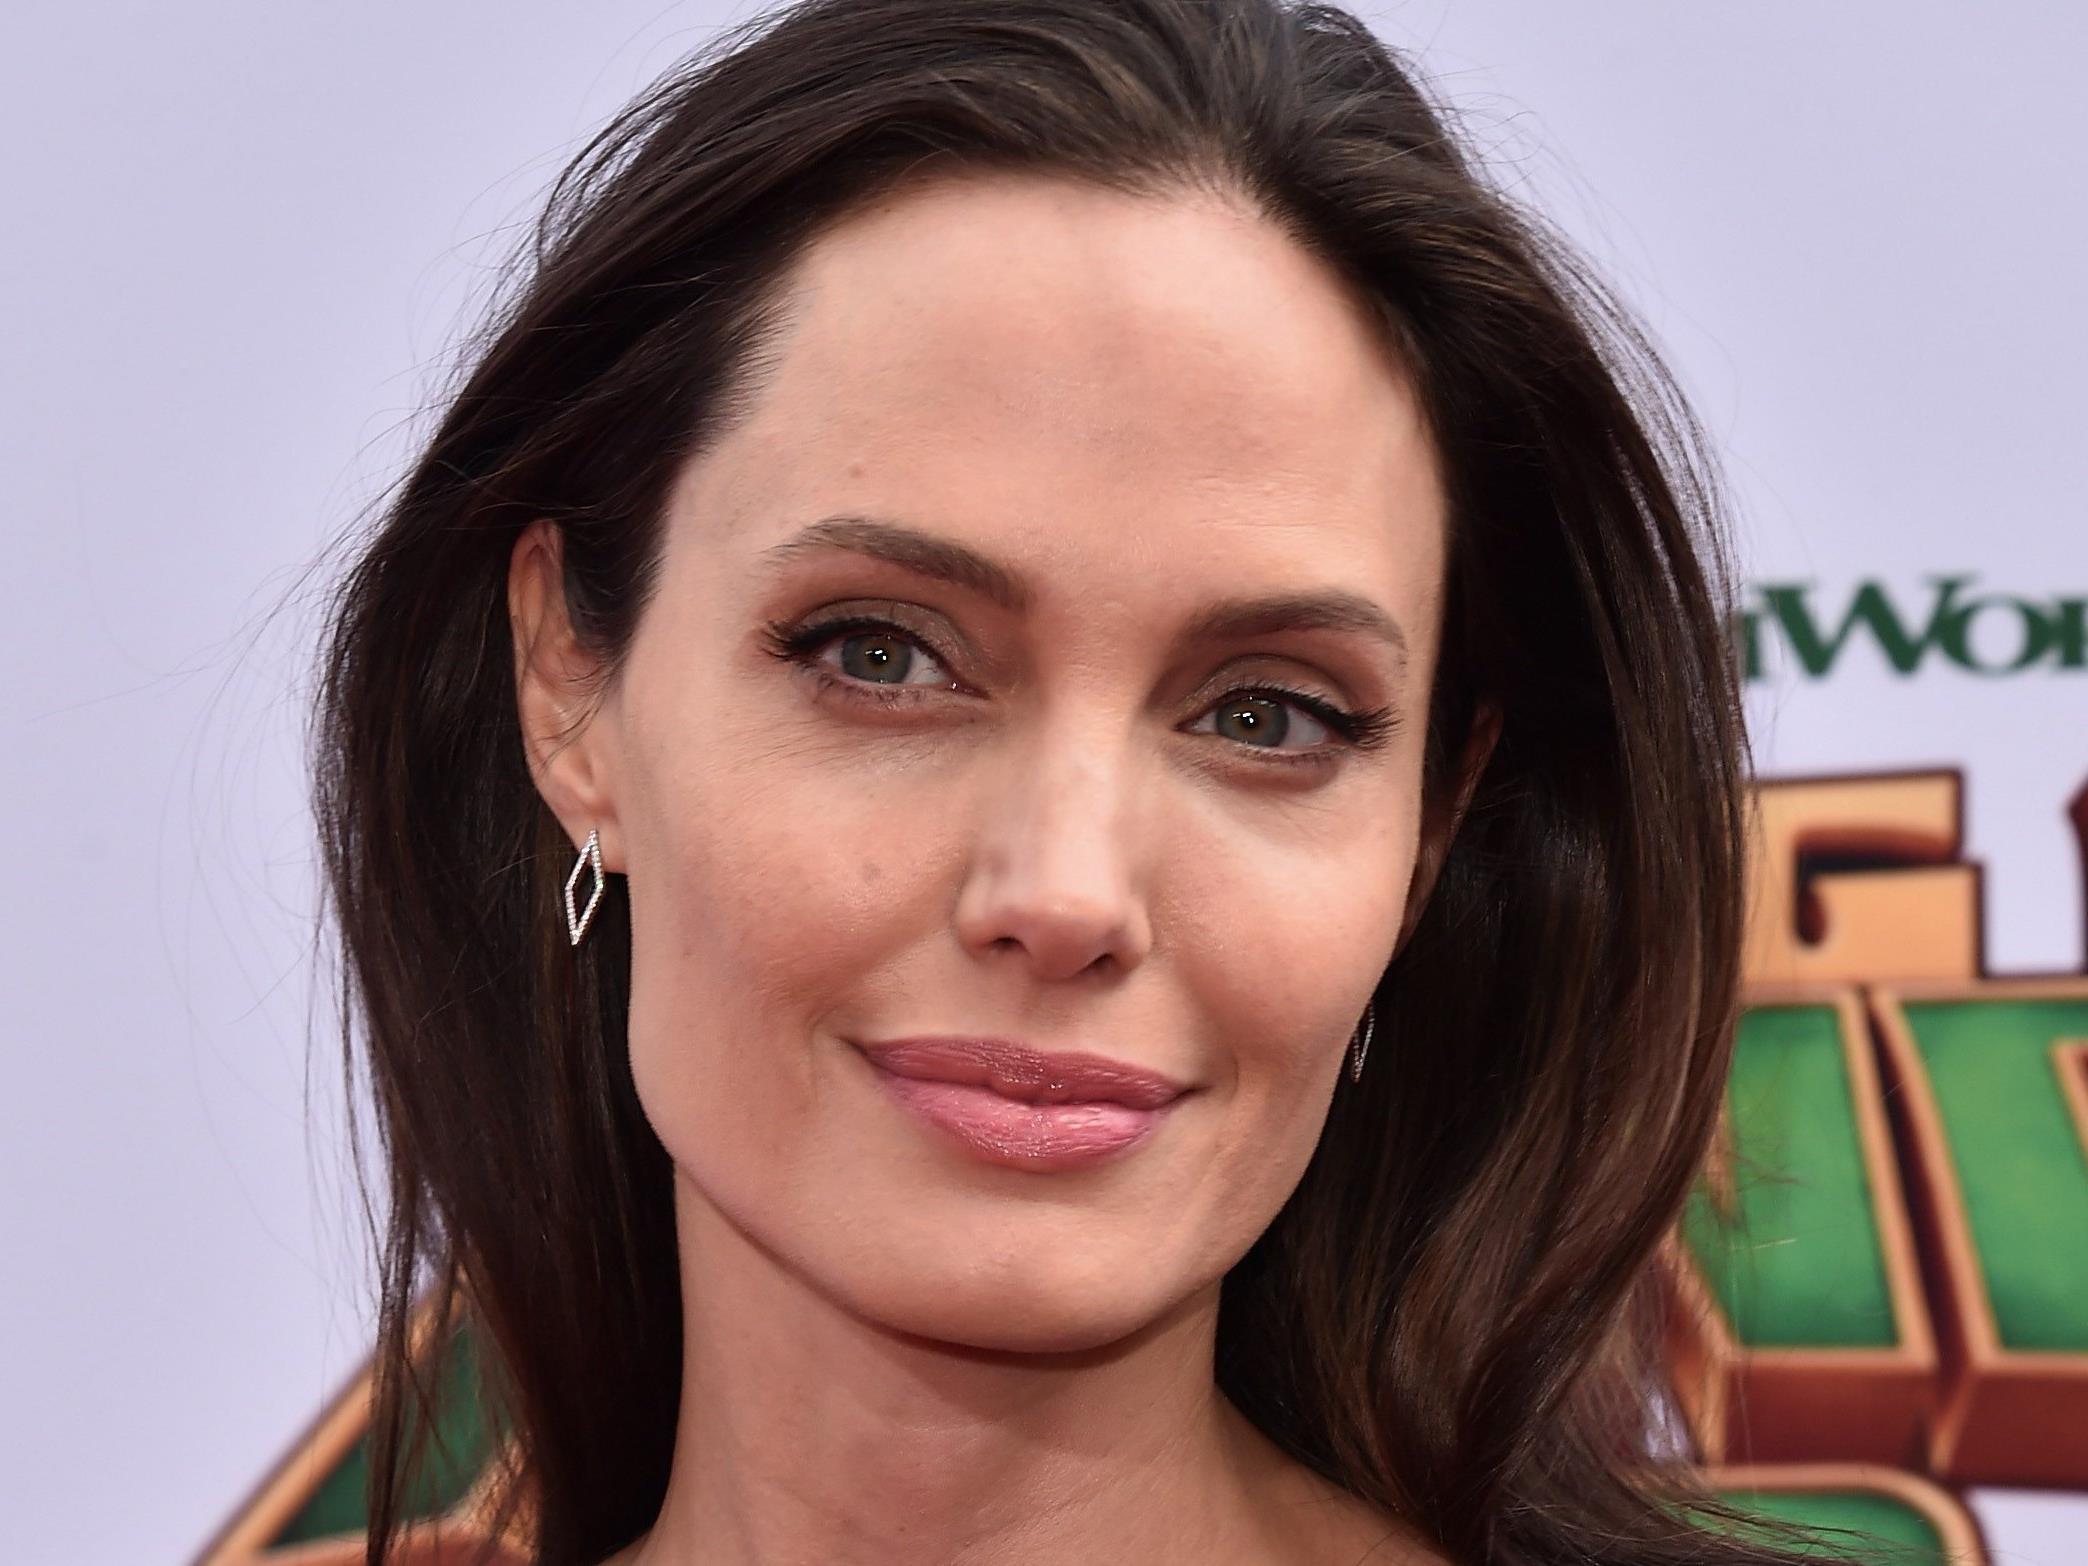 Angelina Jolie soll die perfekten Wangen haben.